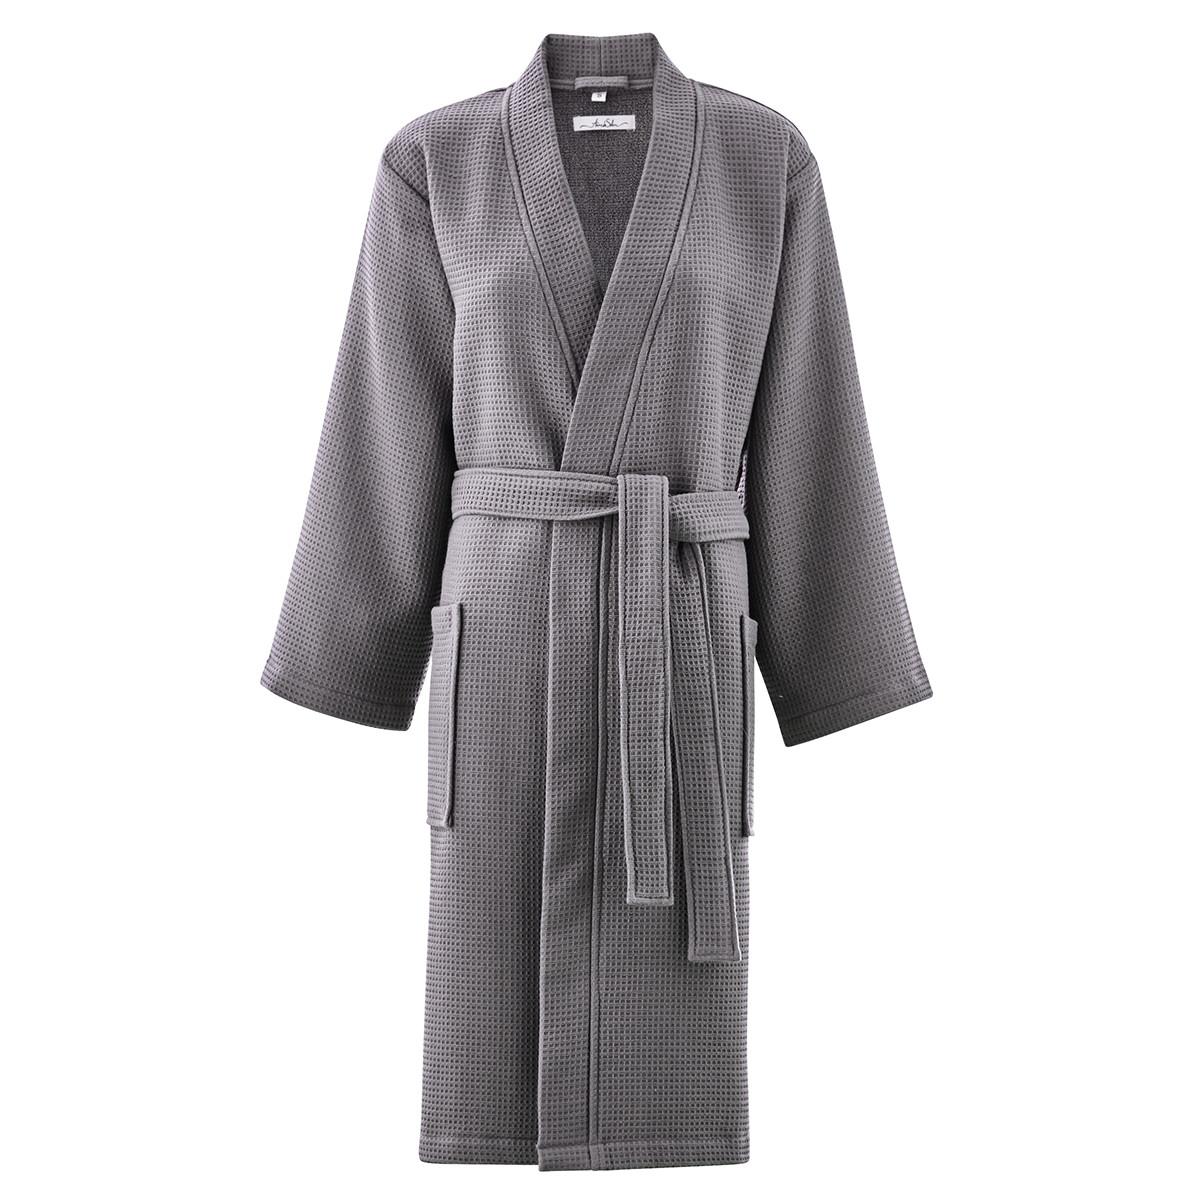 Peignoir coton s gris